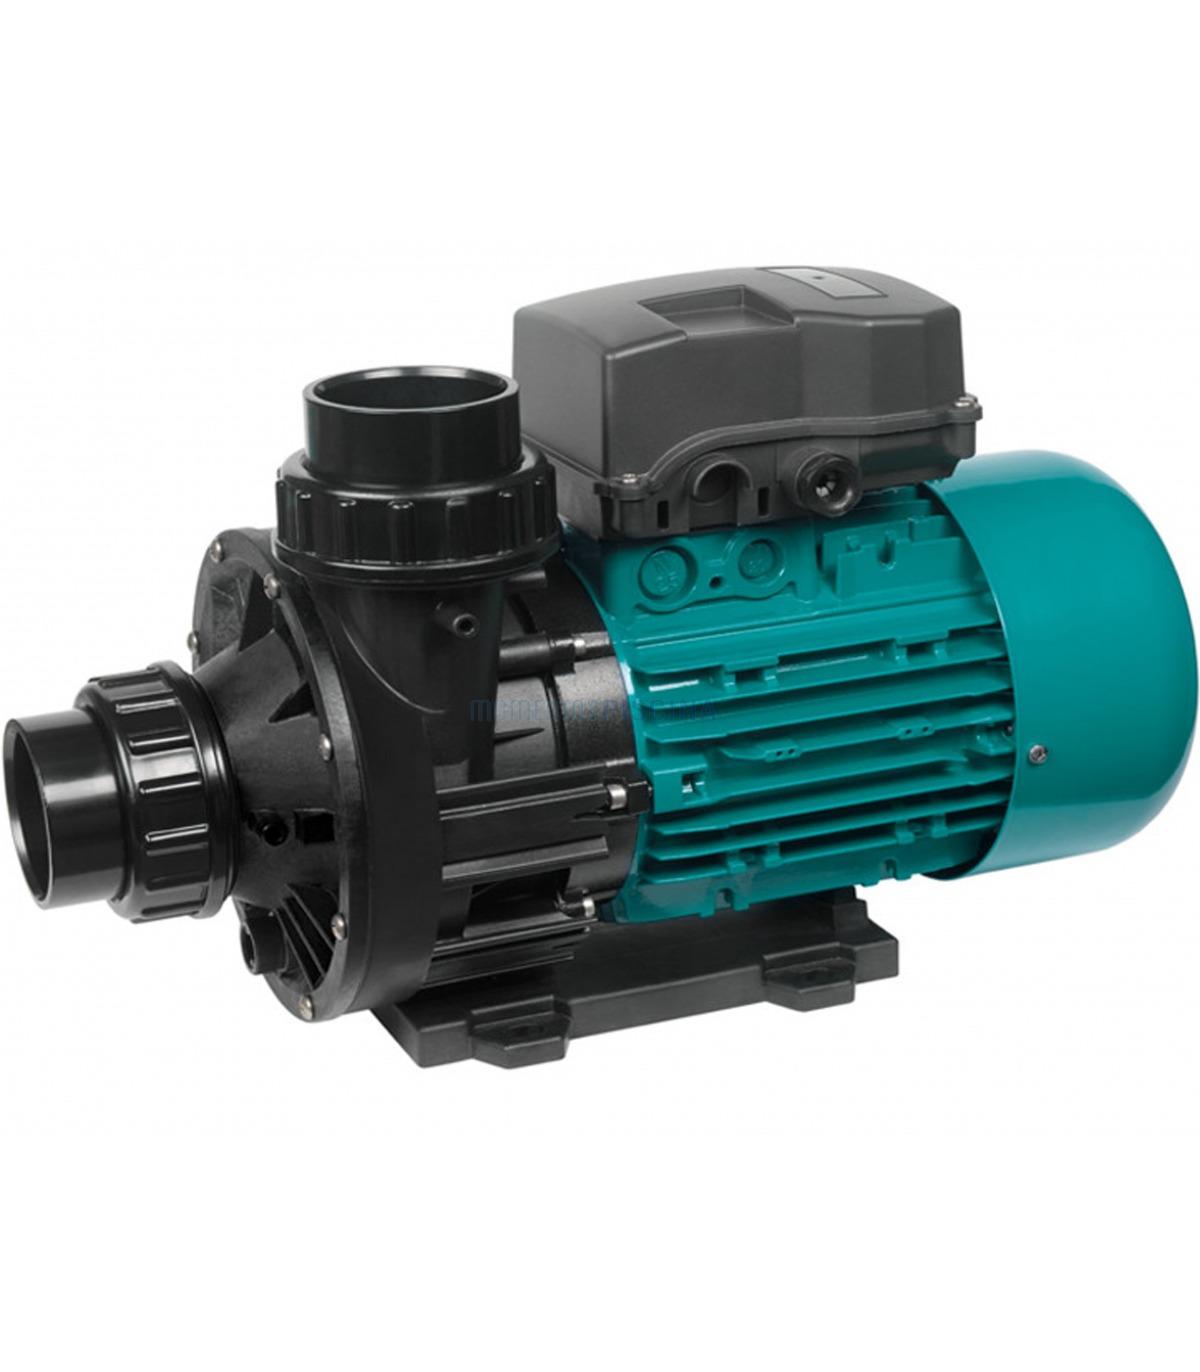 pompe d u0026 39 hydromassage et spa espa wiper 1 5 t